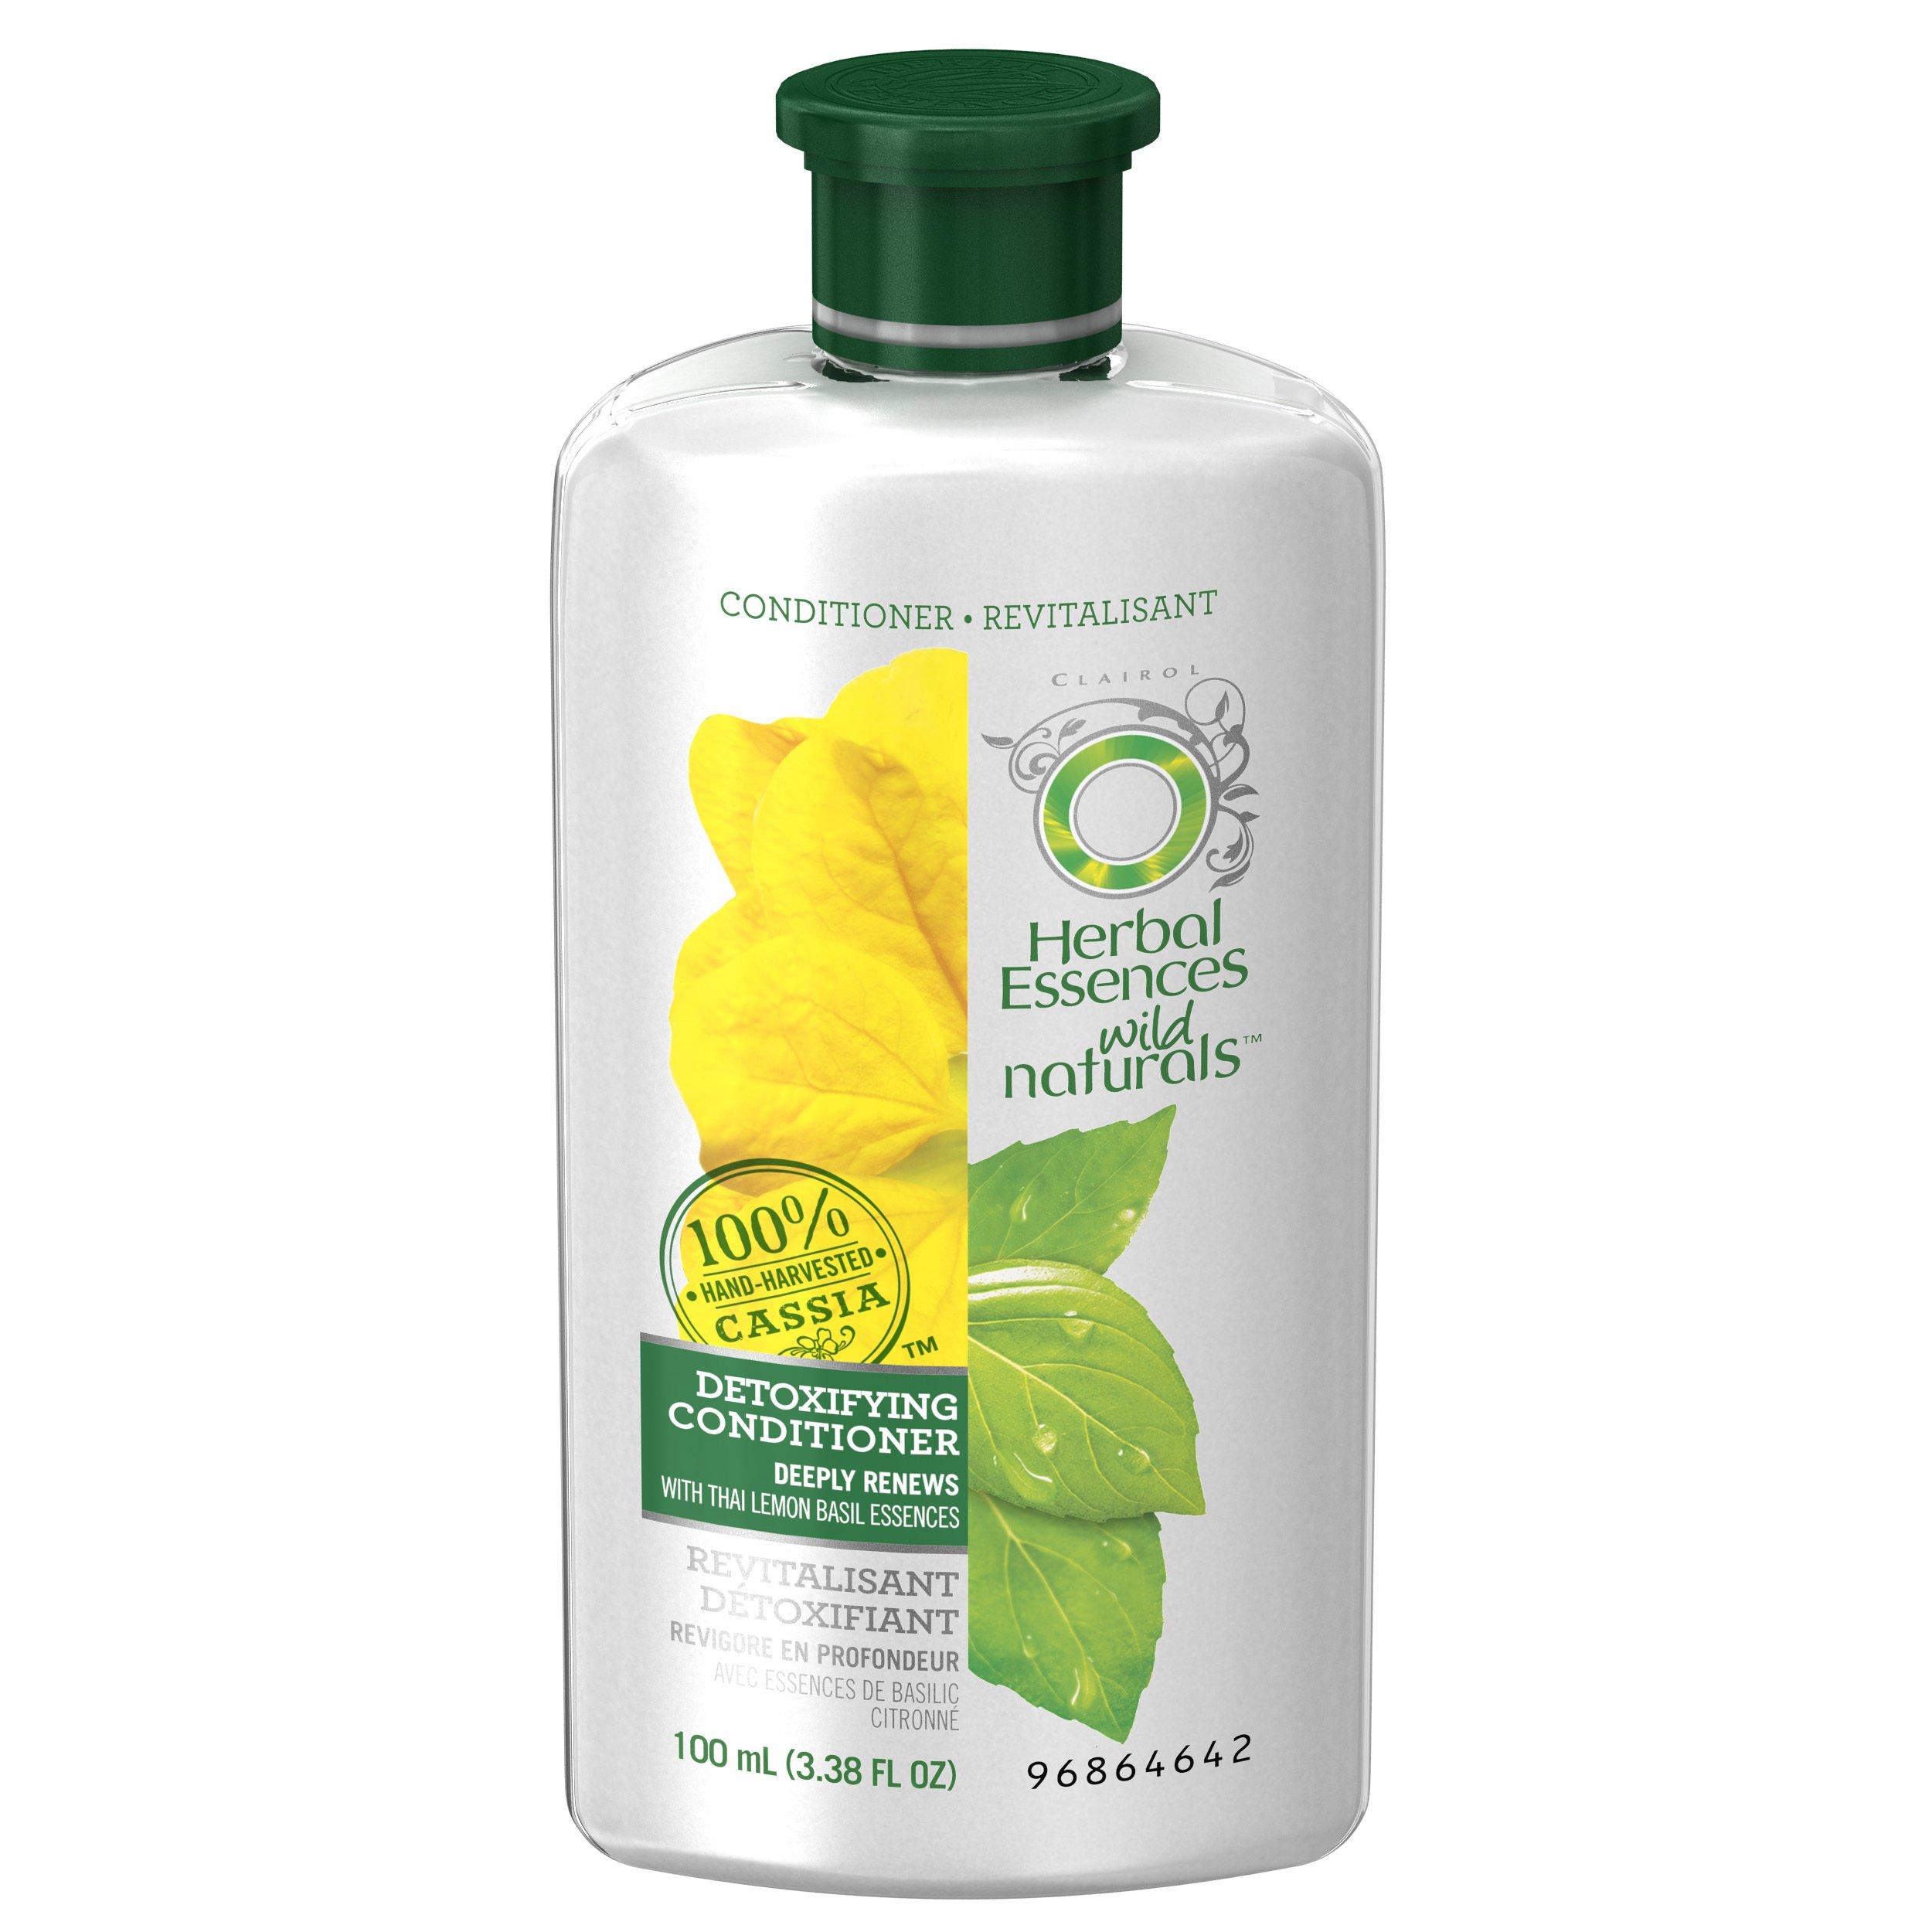 Herbal Essences Wild Naturals Detoxifying Conditioner, 3.38 FL OZ by Herbal Essences (Image #2)